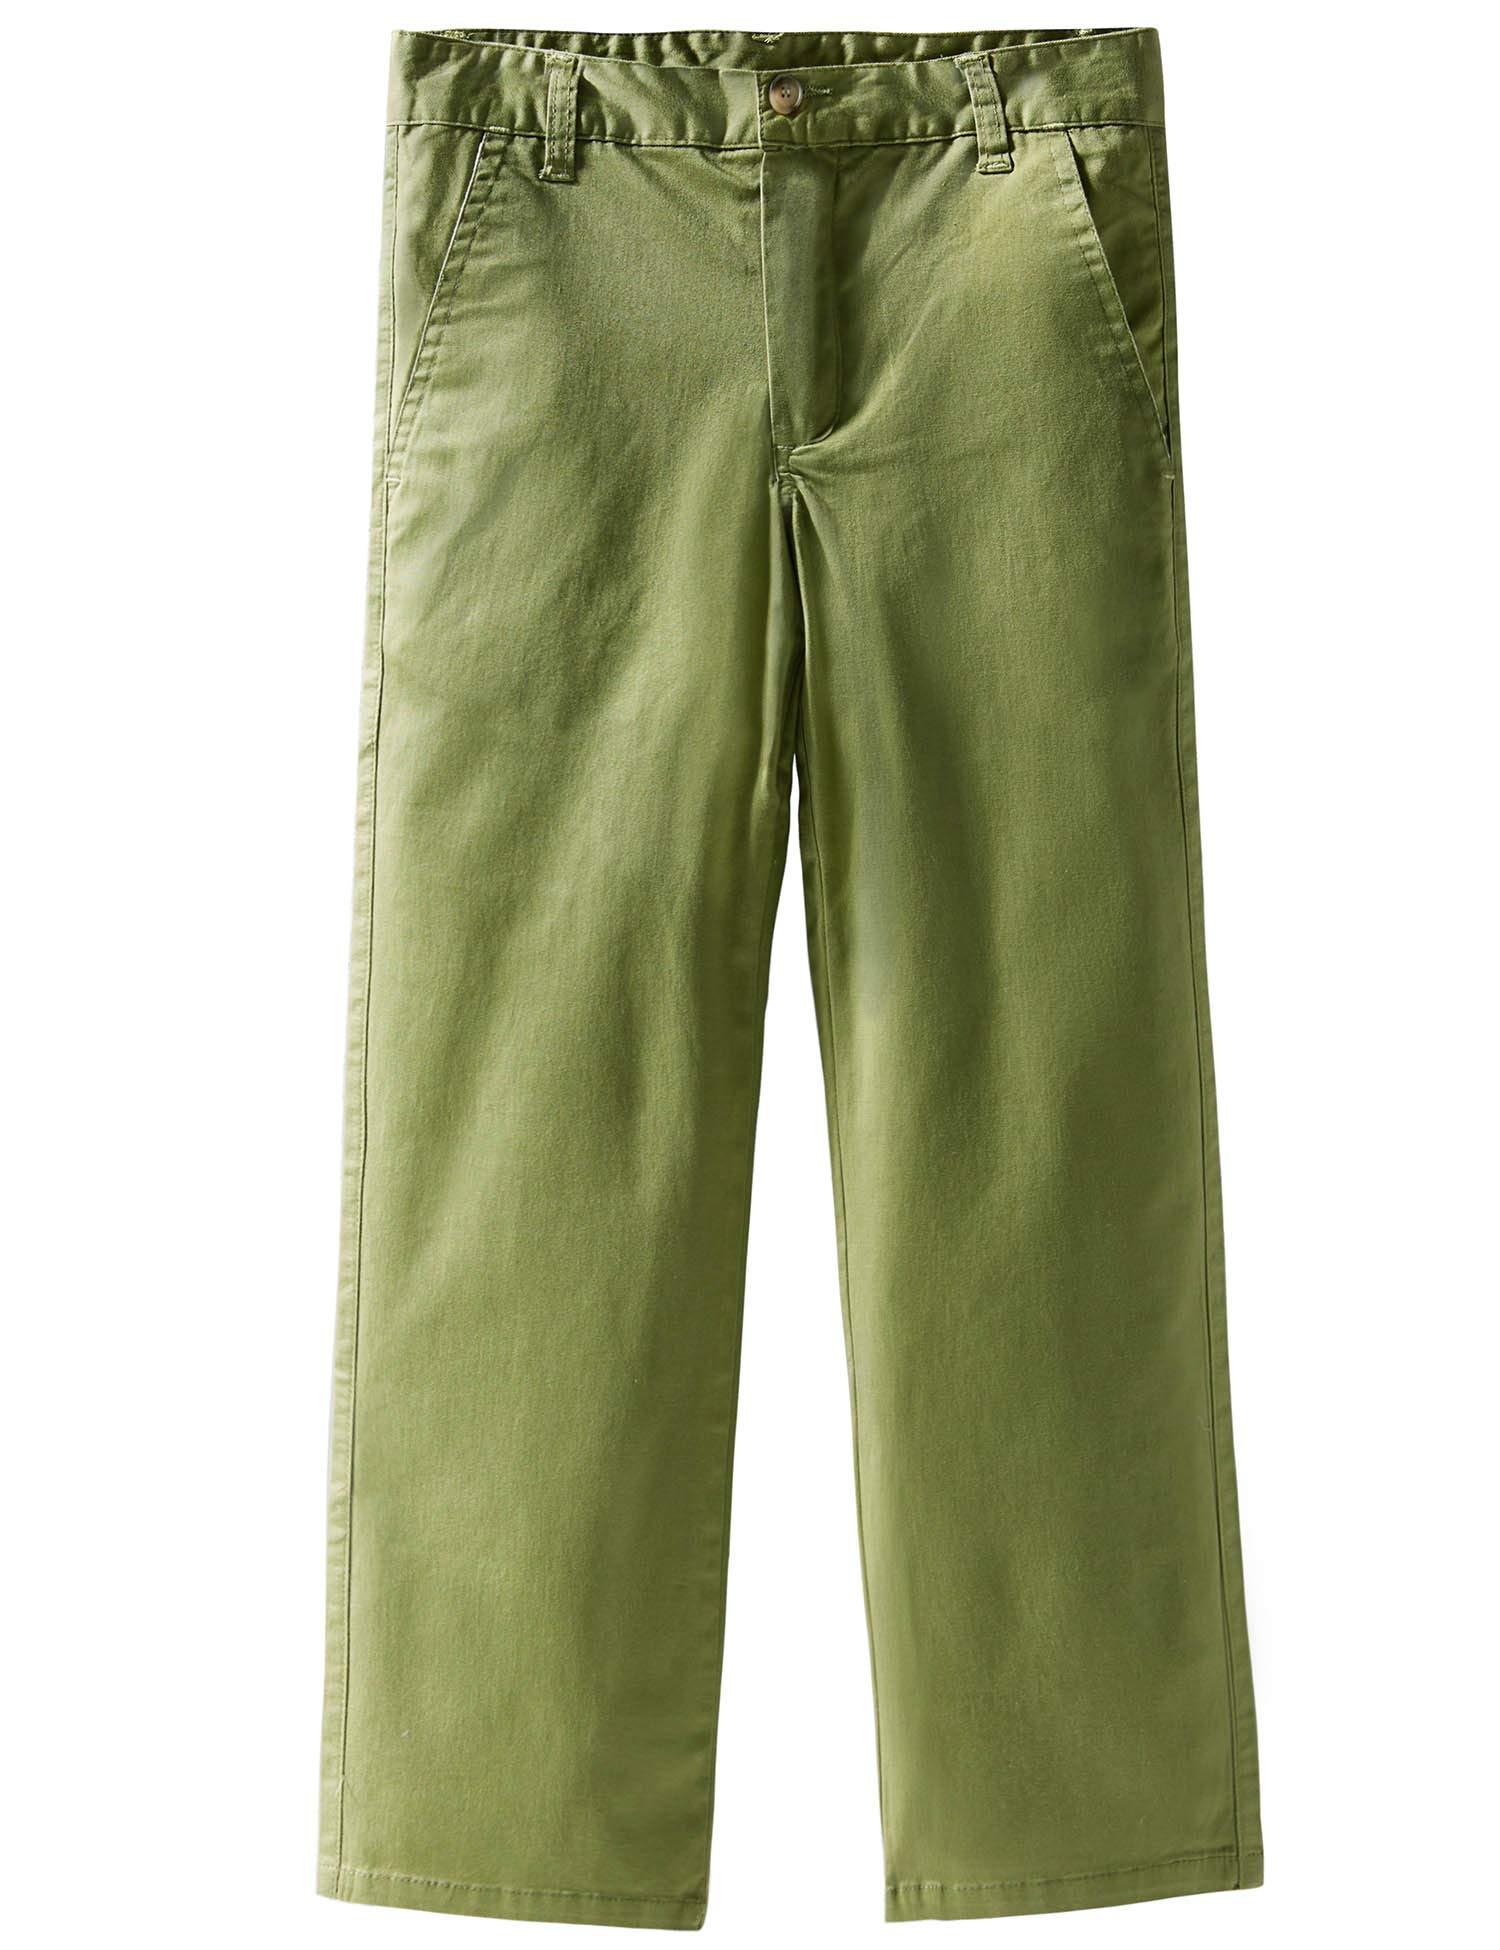 Spring/&Gege Boys Cotton Twill Flat Front Uniform Stretch Chino Shorts